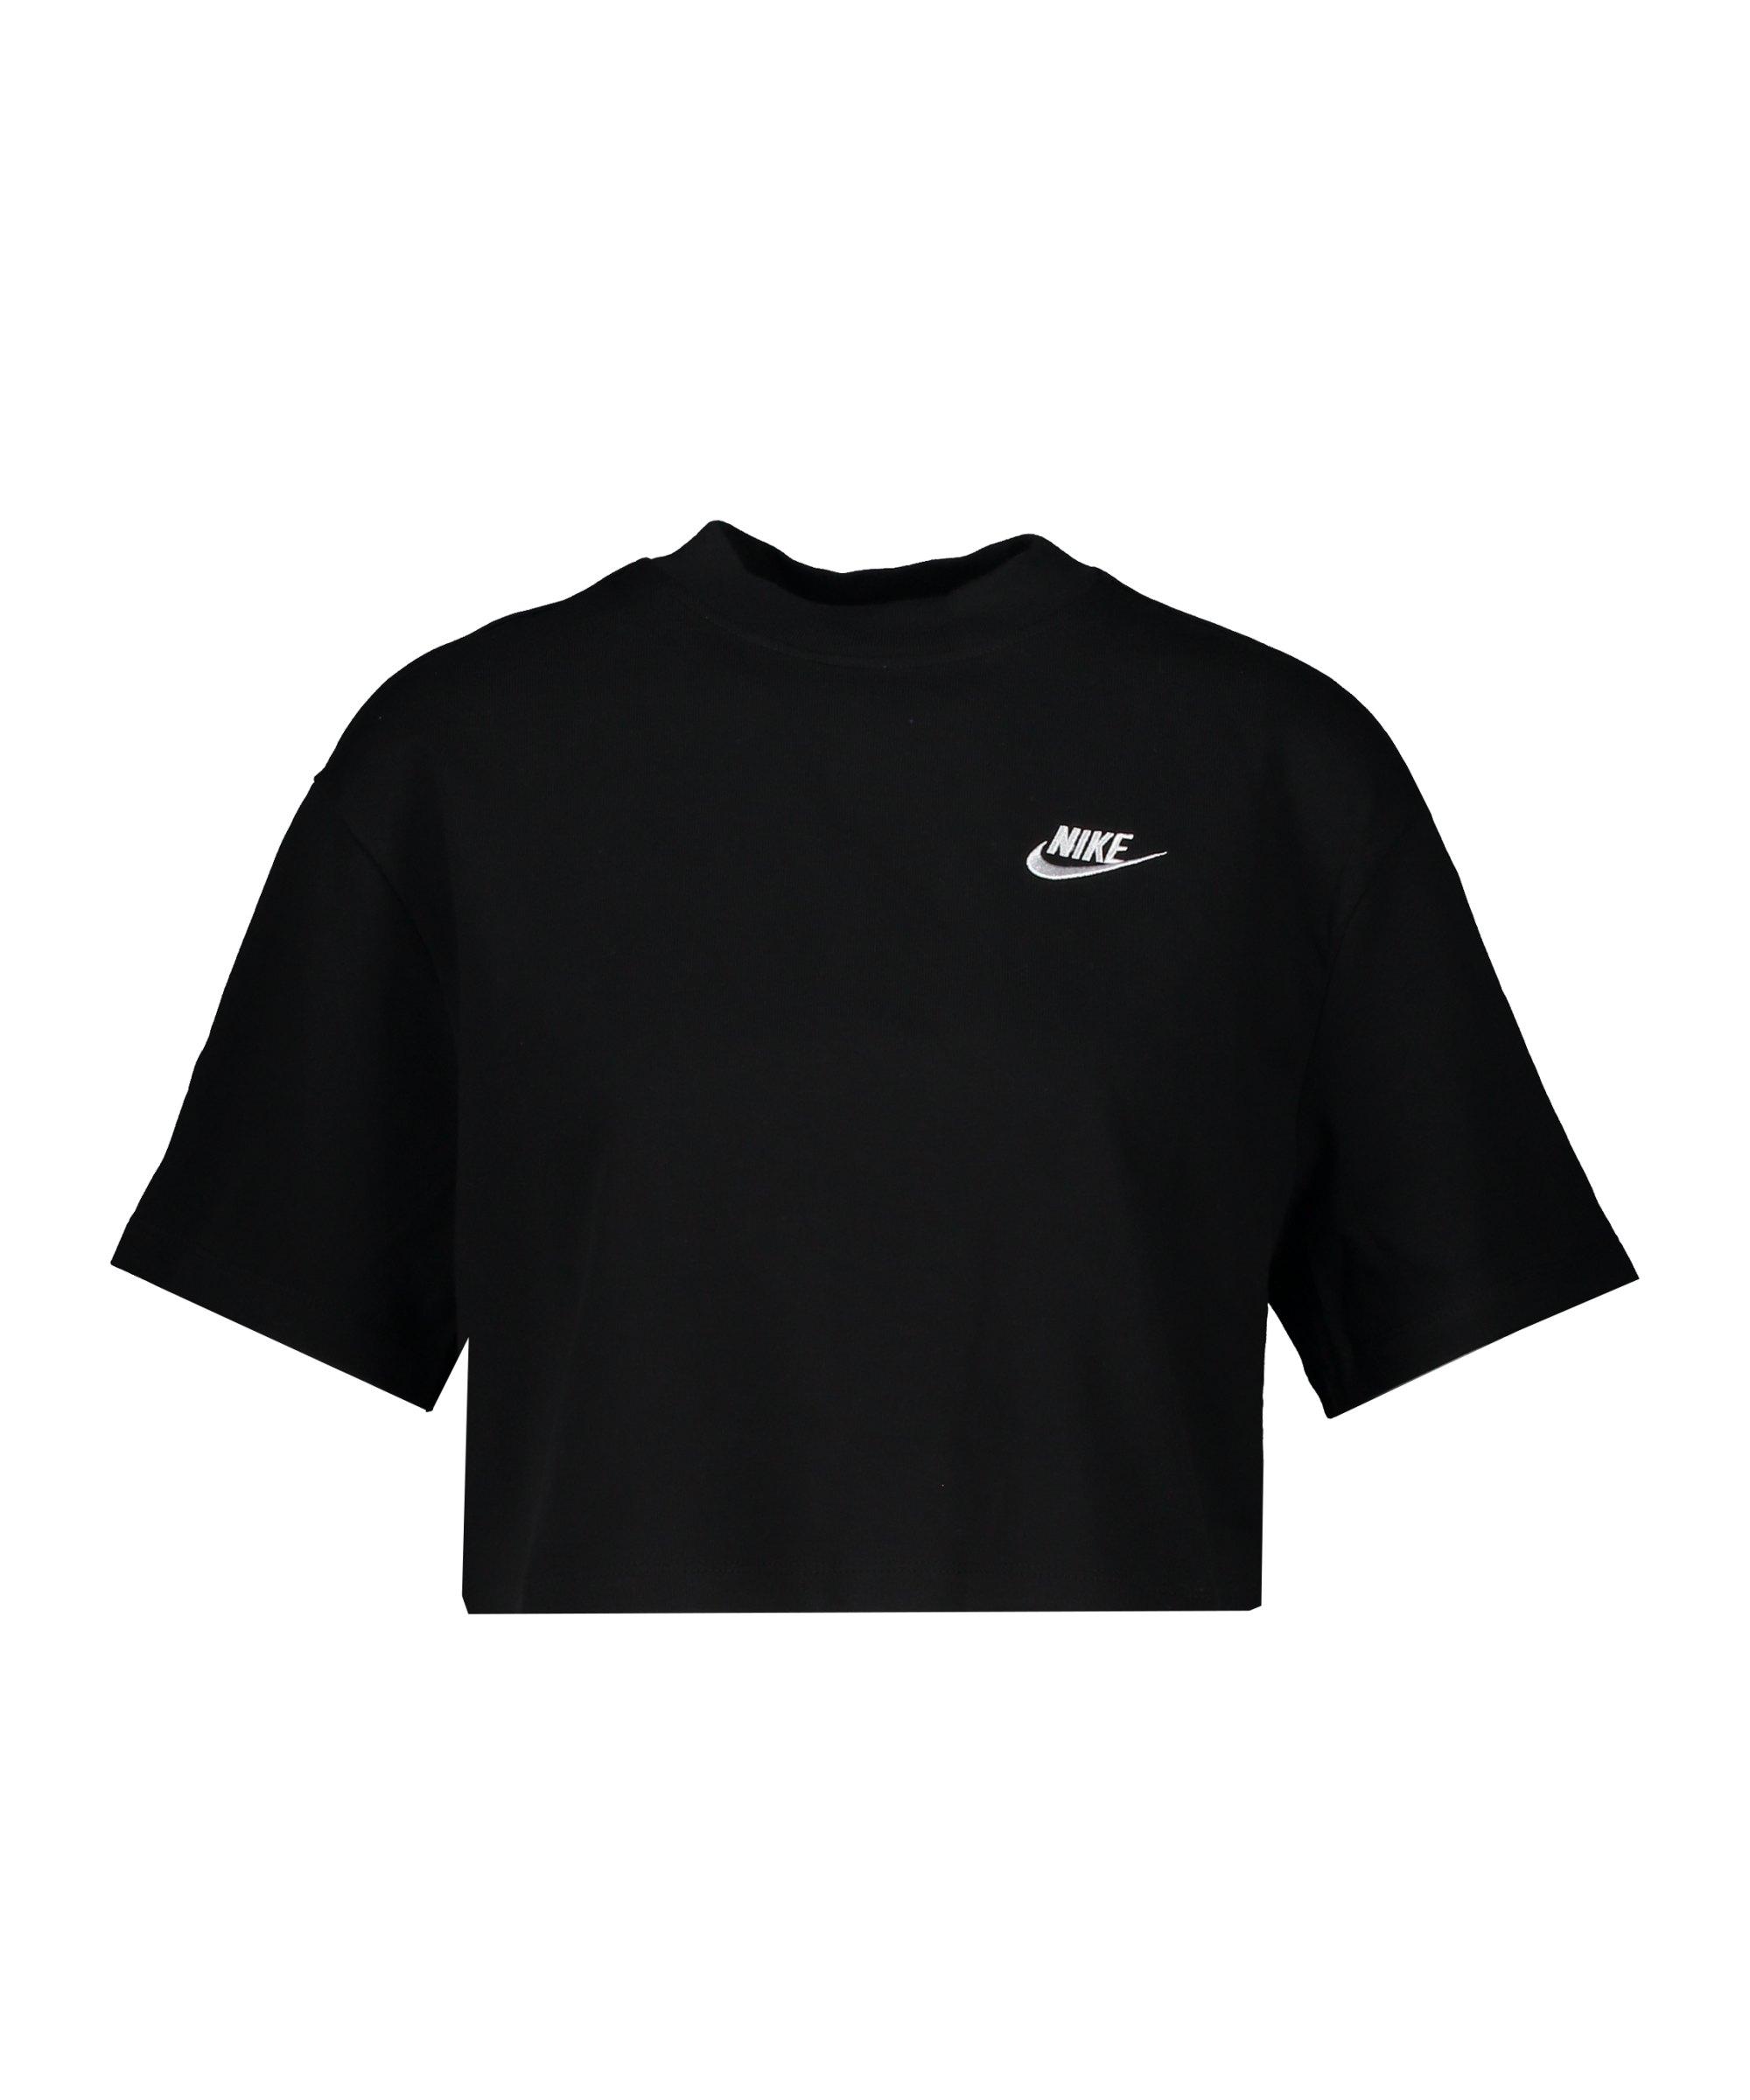 Nike Jersey Top Damen Schwarz Weiss F011 - schwarz